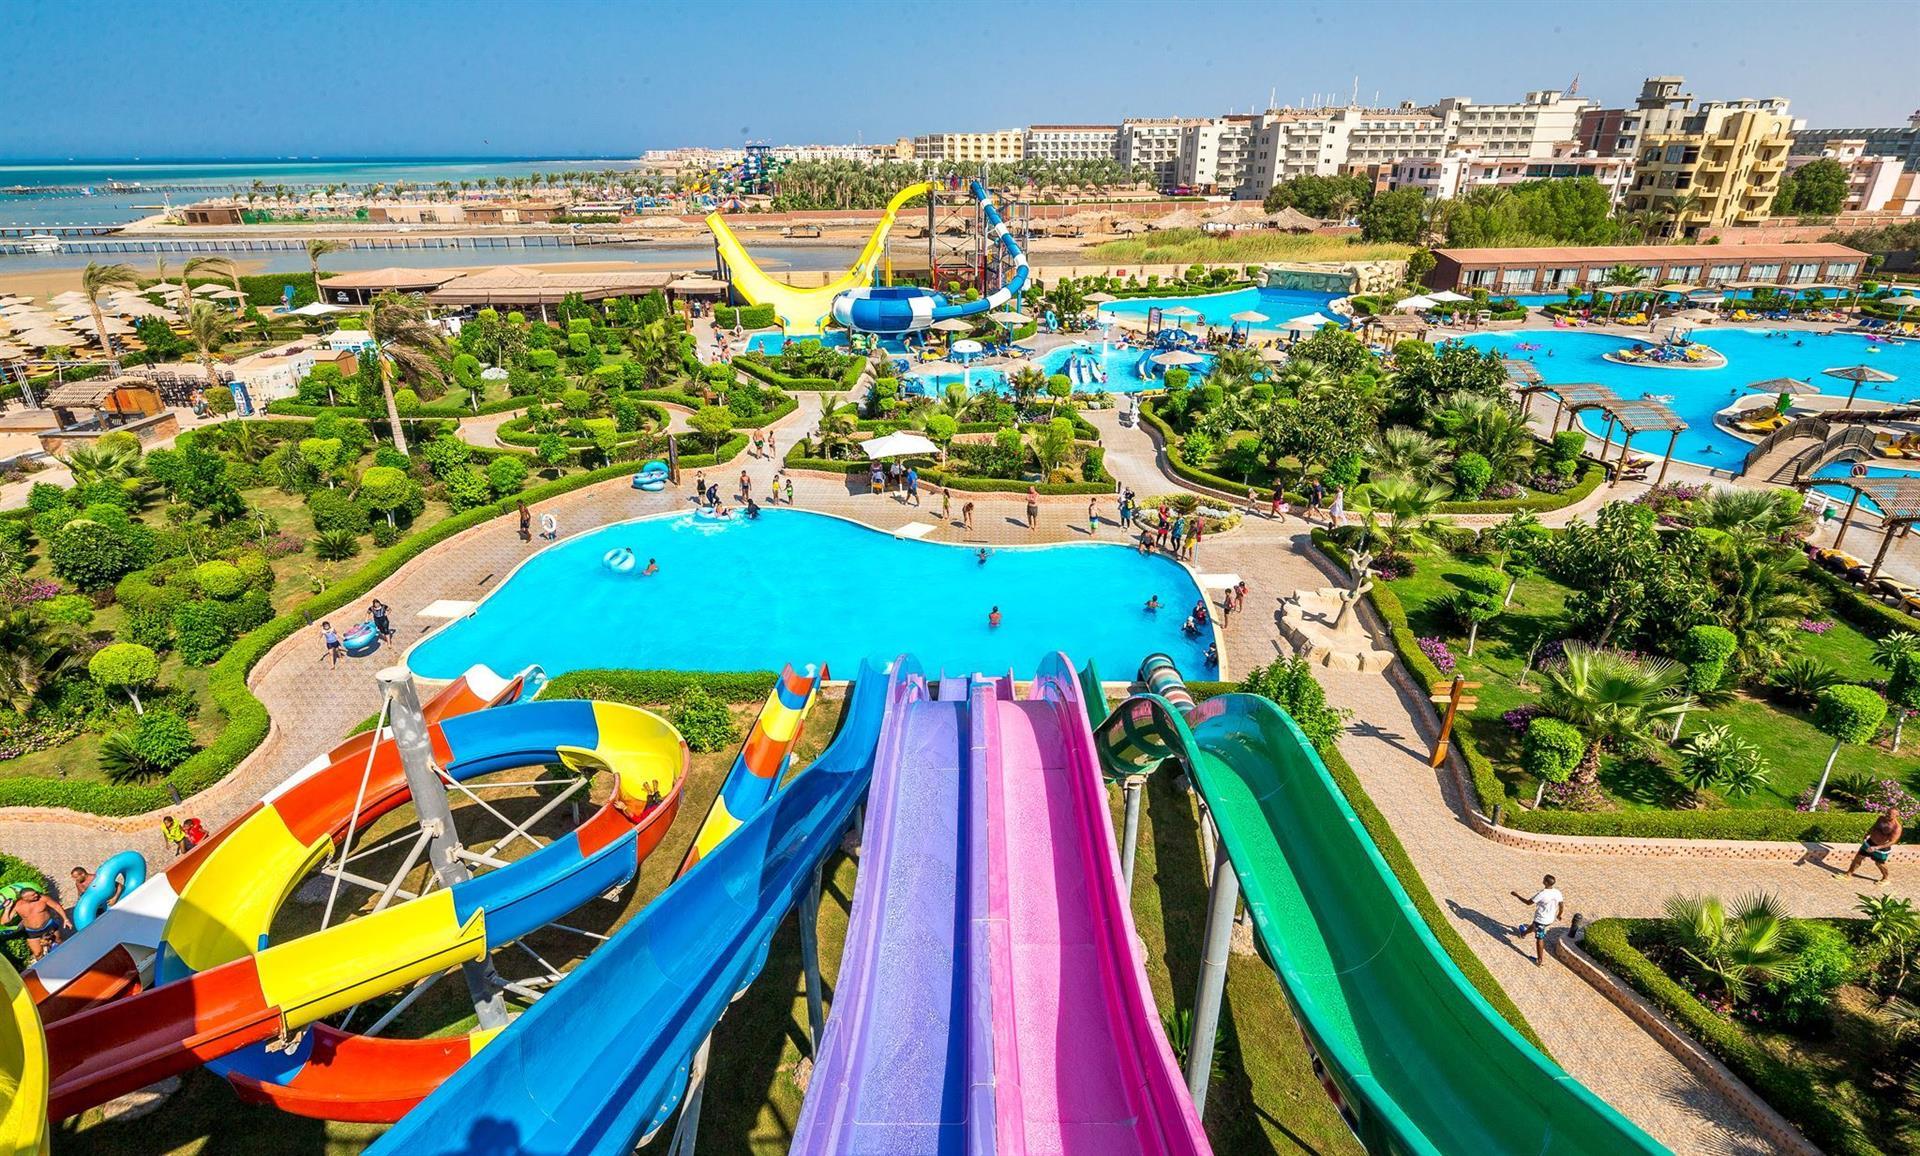 Египет HAWAII CAESAR PALACE HOTEL & AQUAPARK (EX. MIRAGE AQUAPARK) 5* Хургада